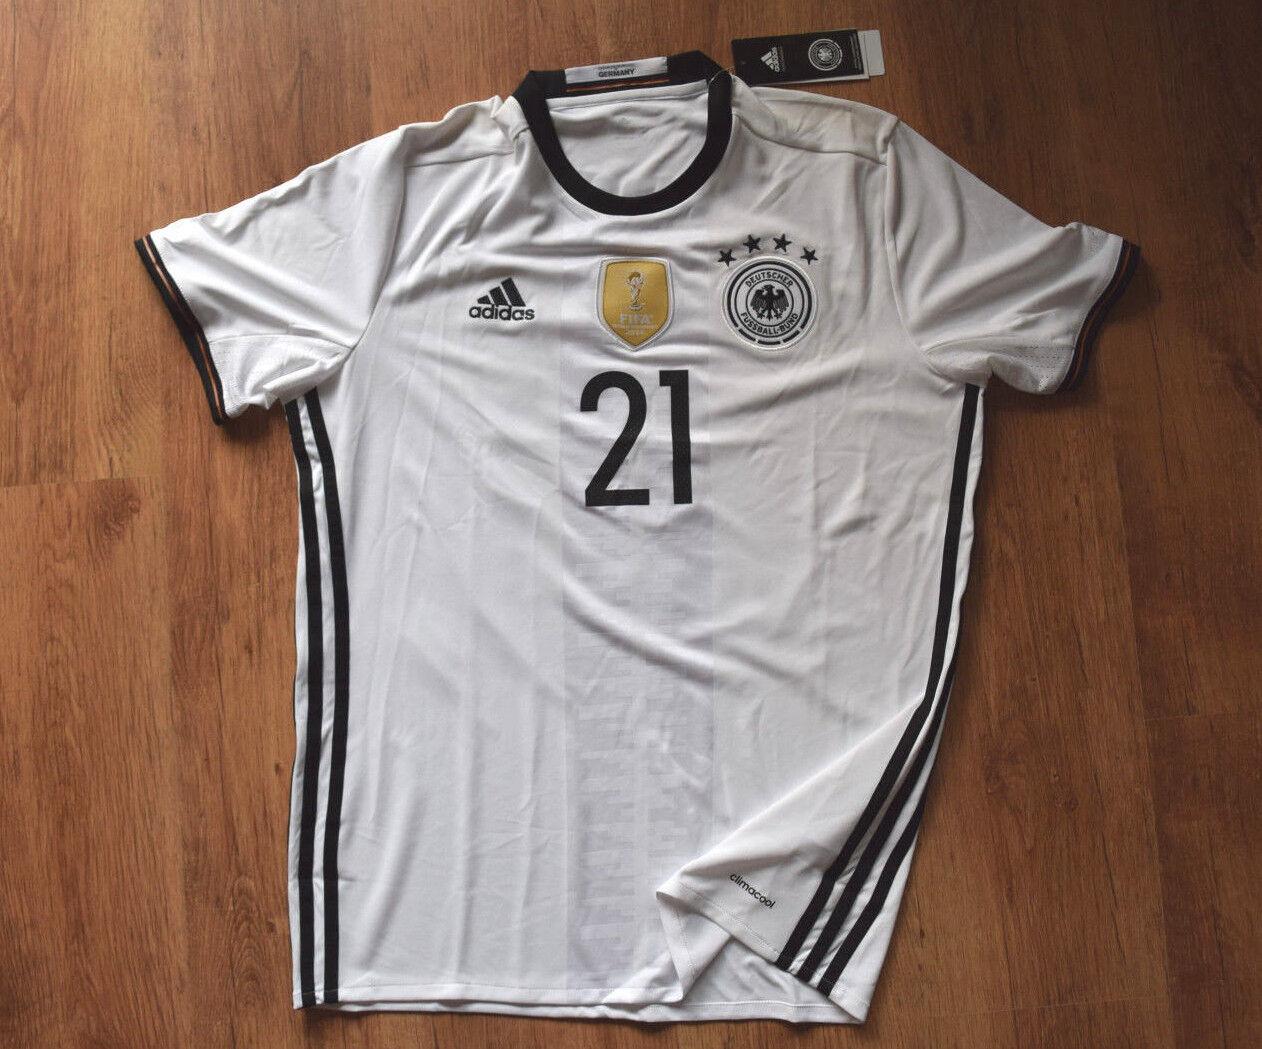 Adidas DFB Heim Trikot Gündogan 21 M L  EM 2016 Deutschland B74830 H JSY Jersey